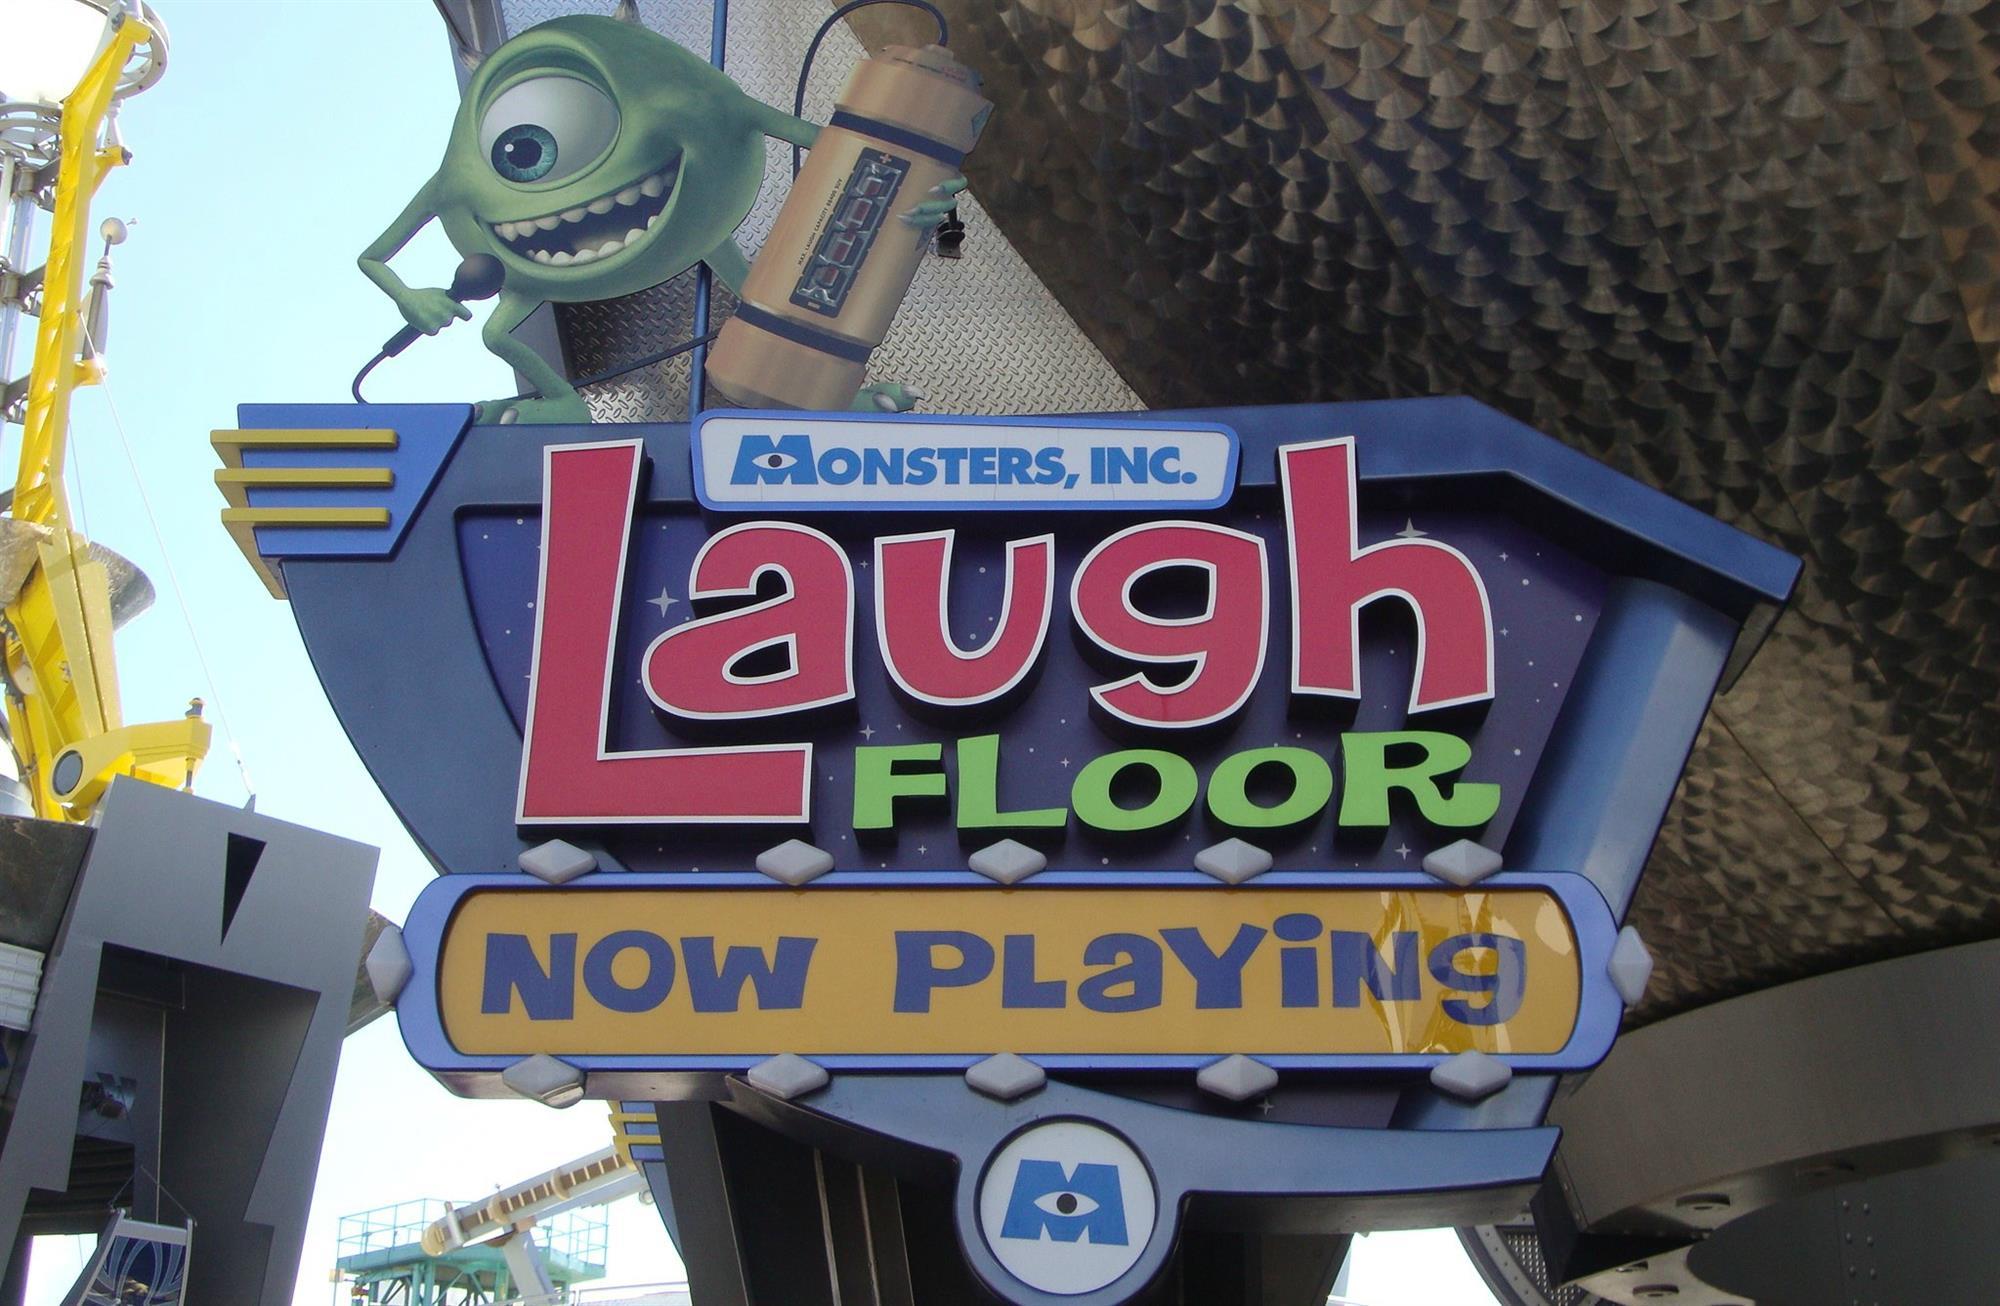 Monsters, Inc. Laugh Floor - Magic